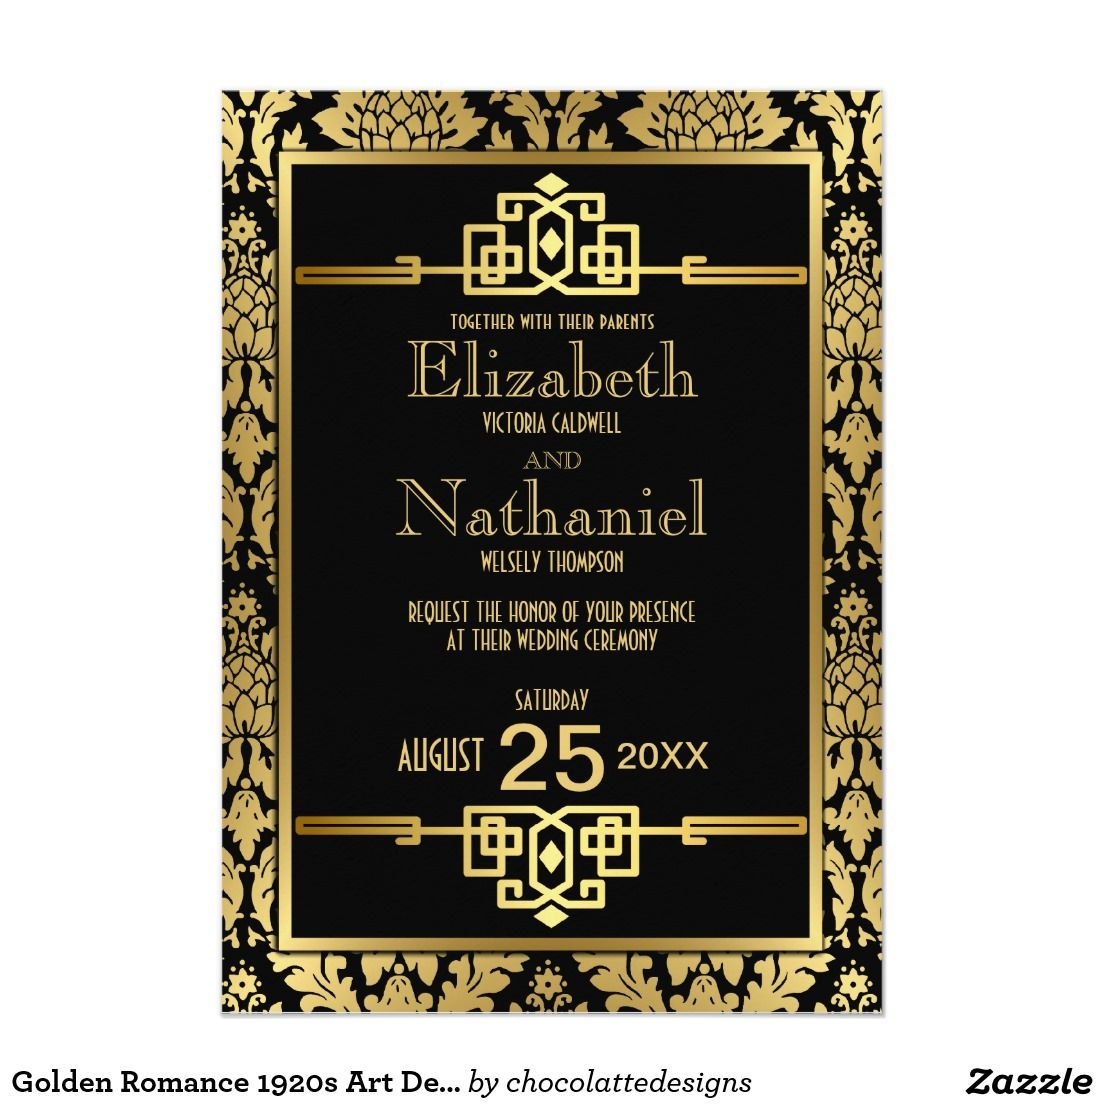 3 Piece Set 1920s Wedding Old Fashioned RSVP Details Invitation Black and Gold Art Deco Wedding Invitation Set INSTANT DOWNLOAD